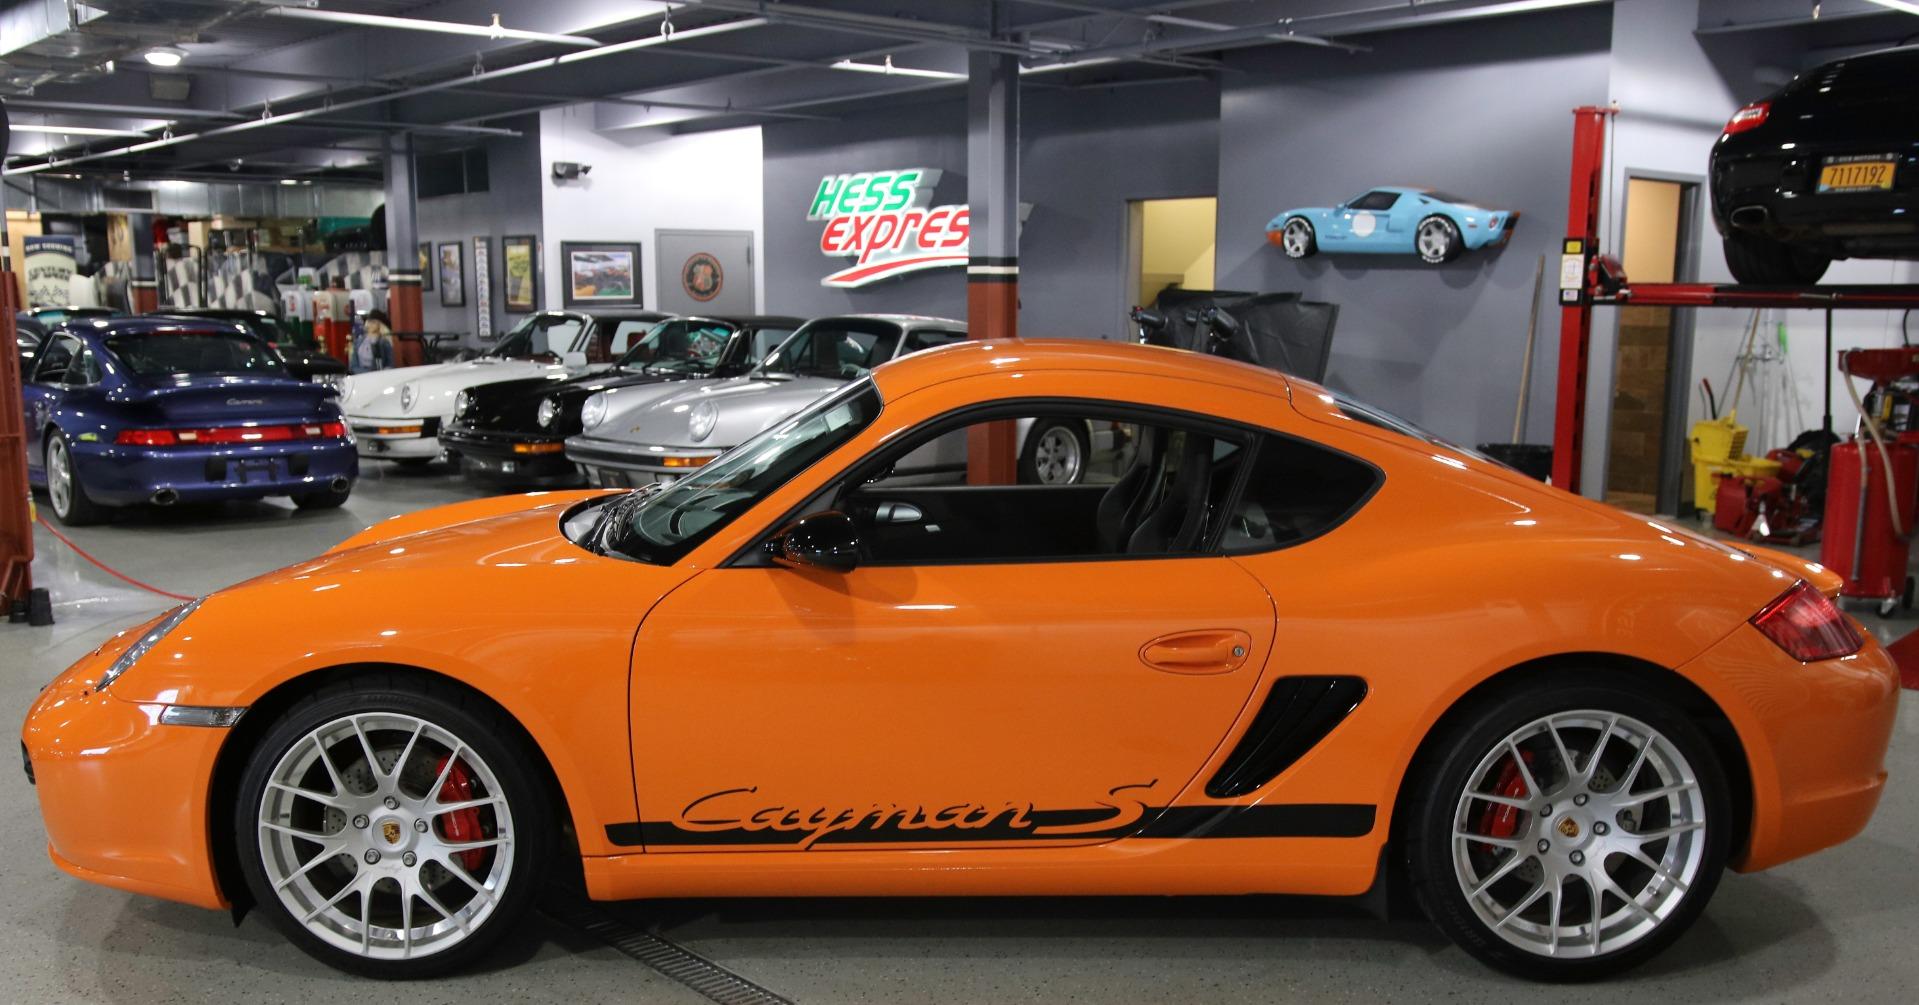 2008 Porsche Cayman S Stock 1229 For Sale Near Oyster